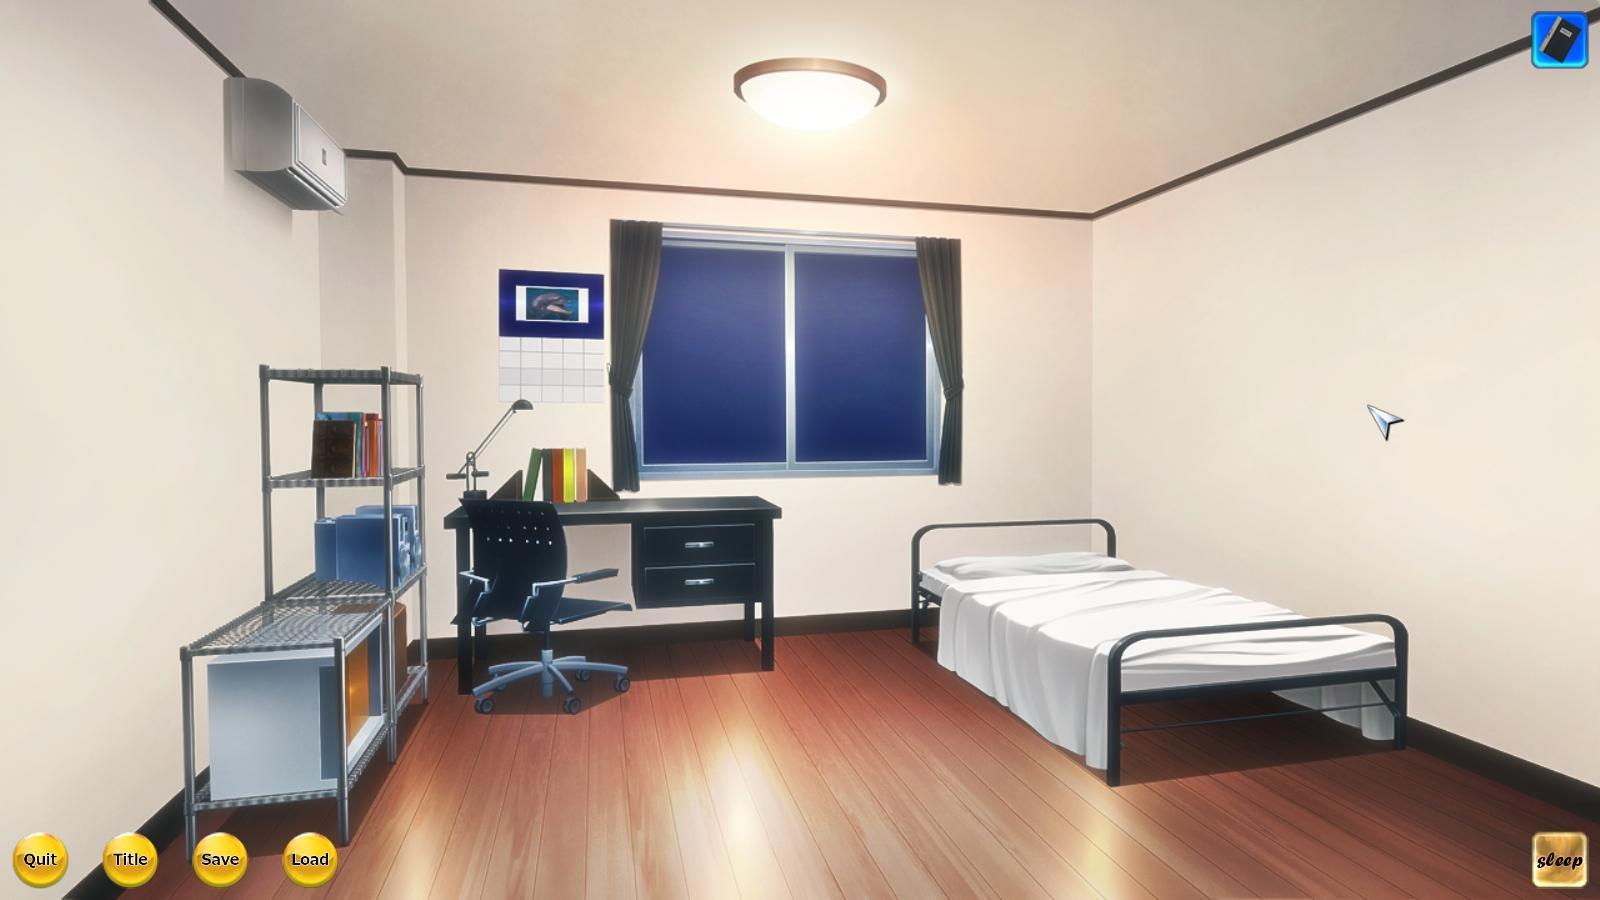 FileAA2 male bedroom nightjpg  Hgames Wiki